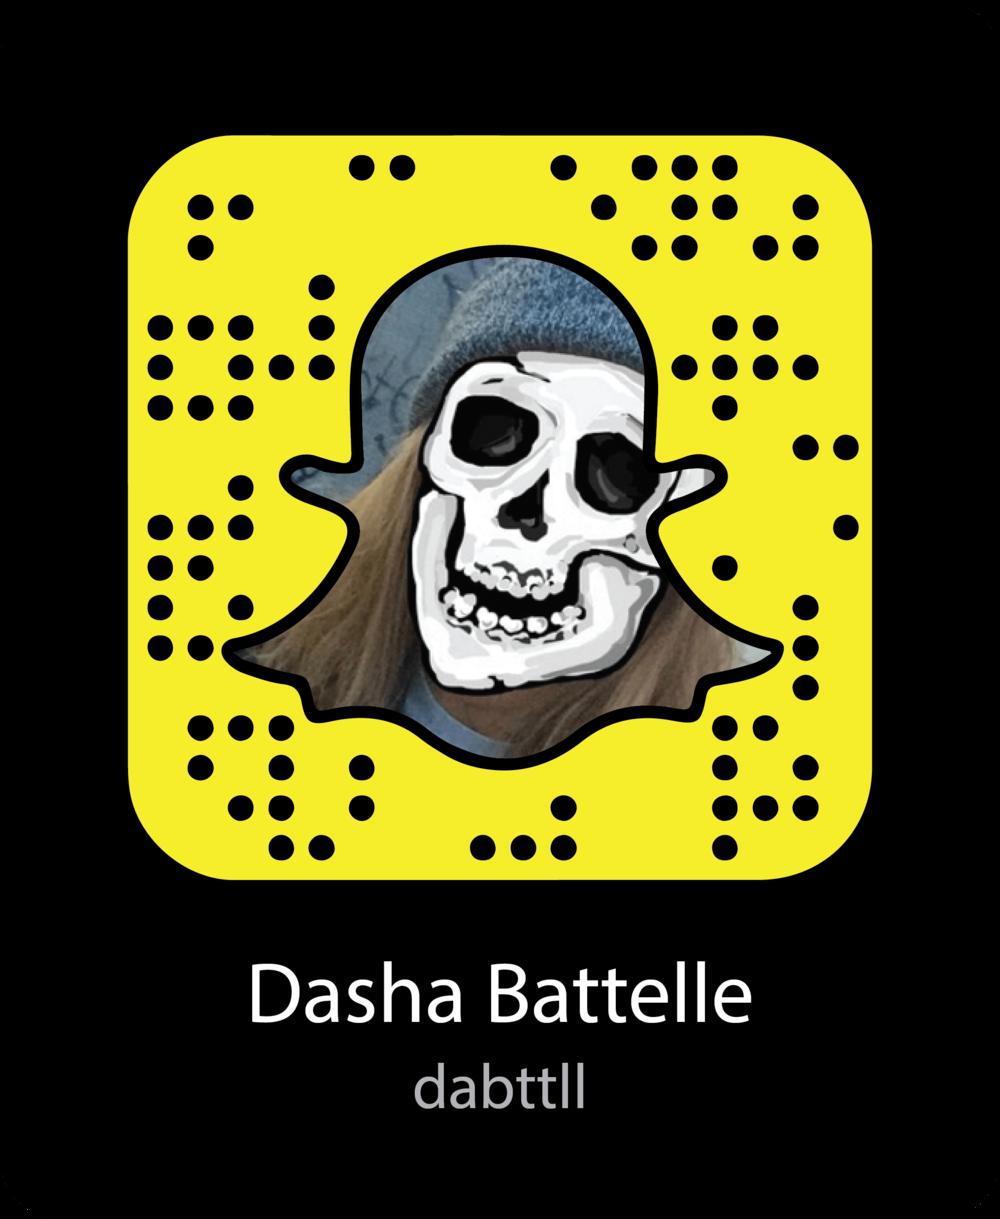 dasha-battelle-artists-snapchat-snapcode